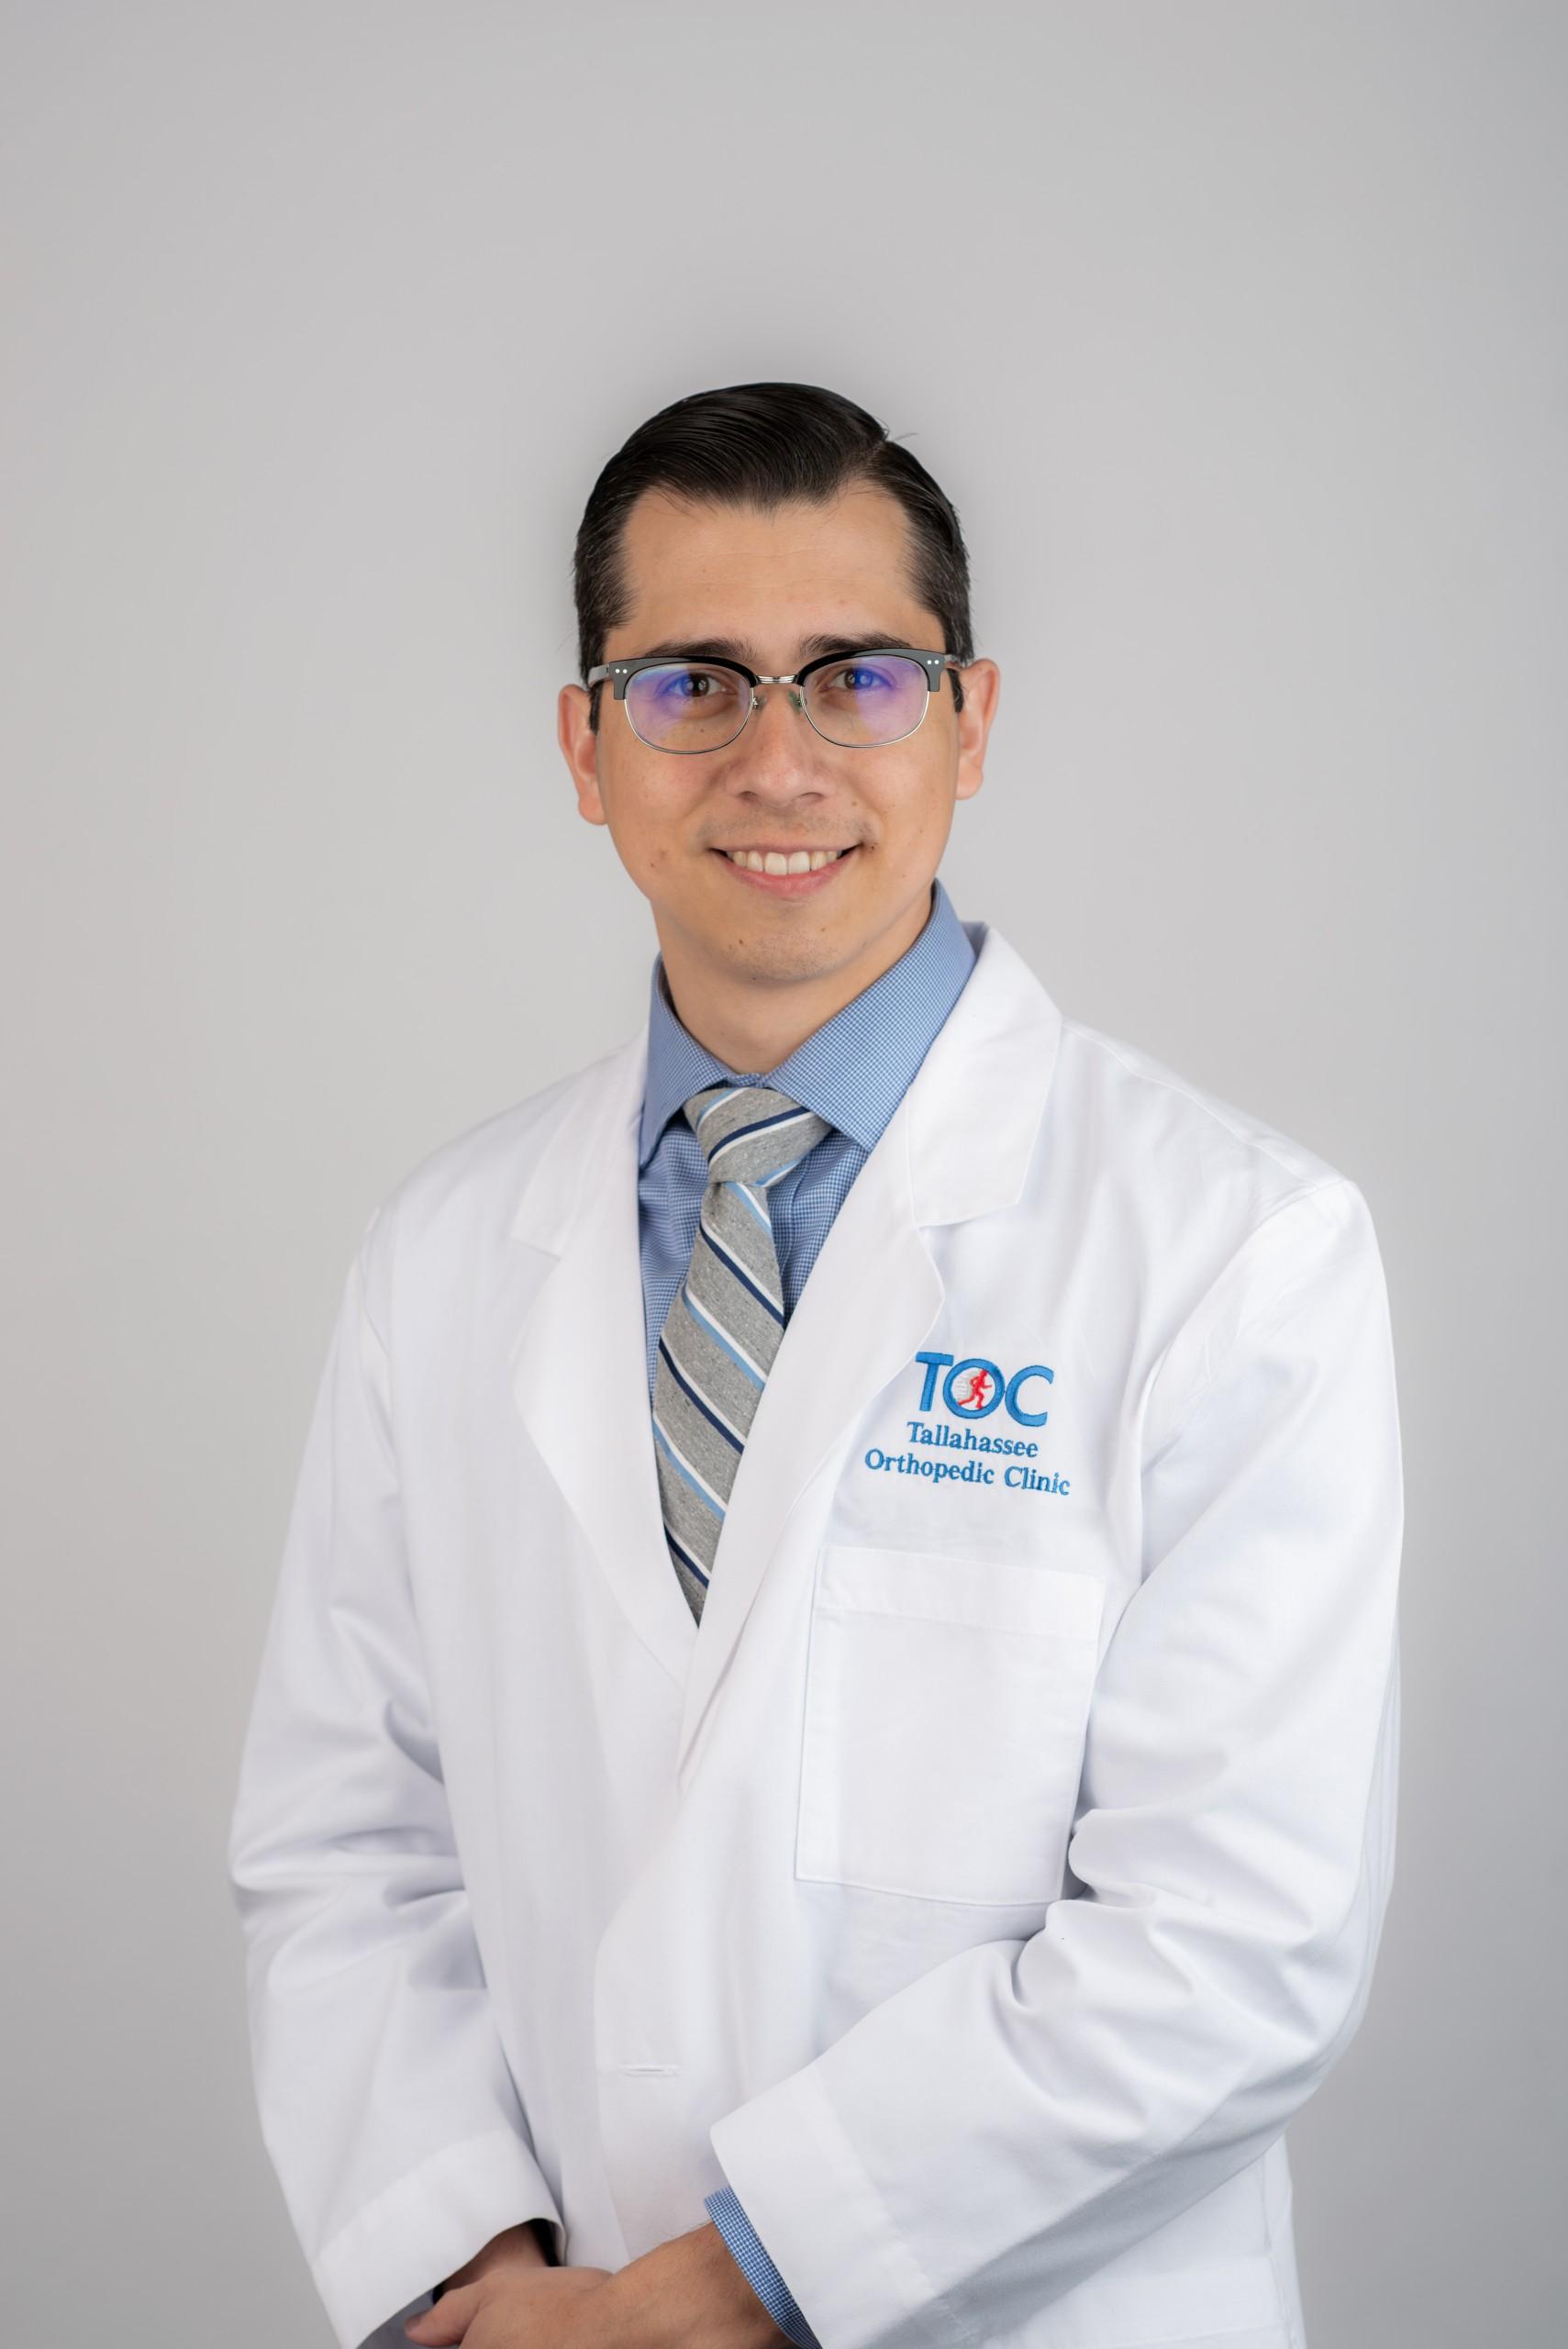 David Alvarez, MD